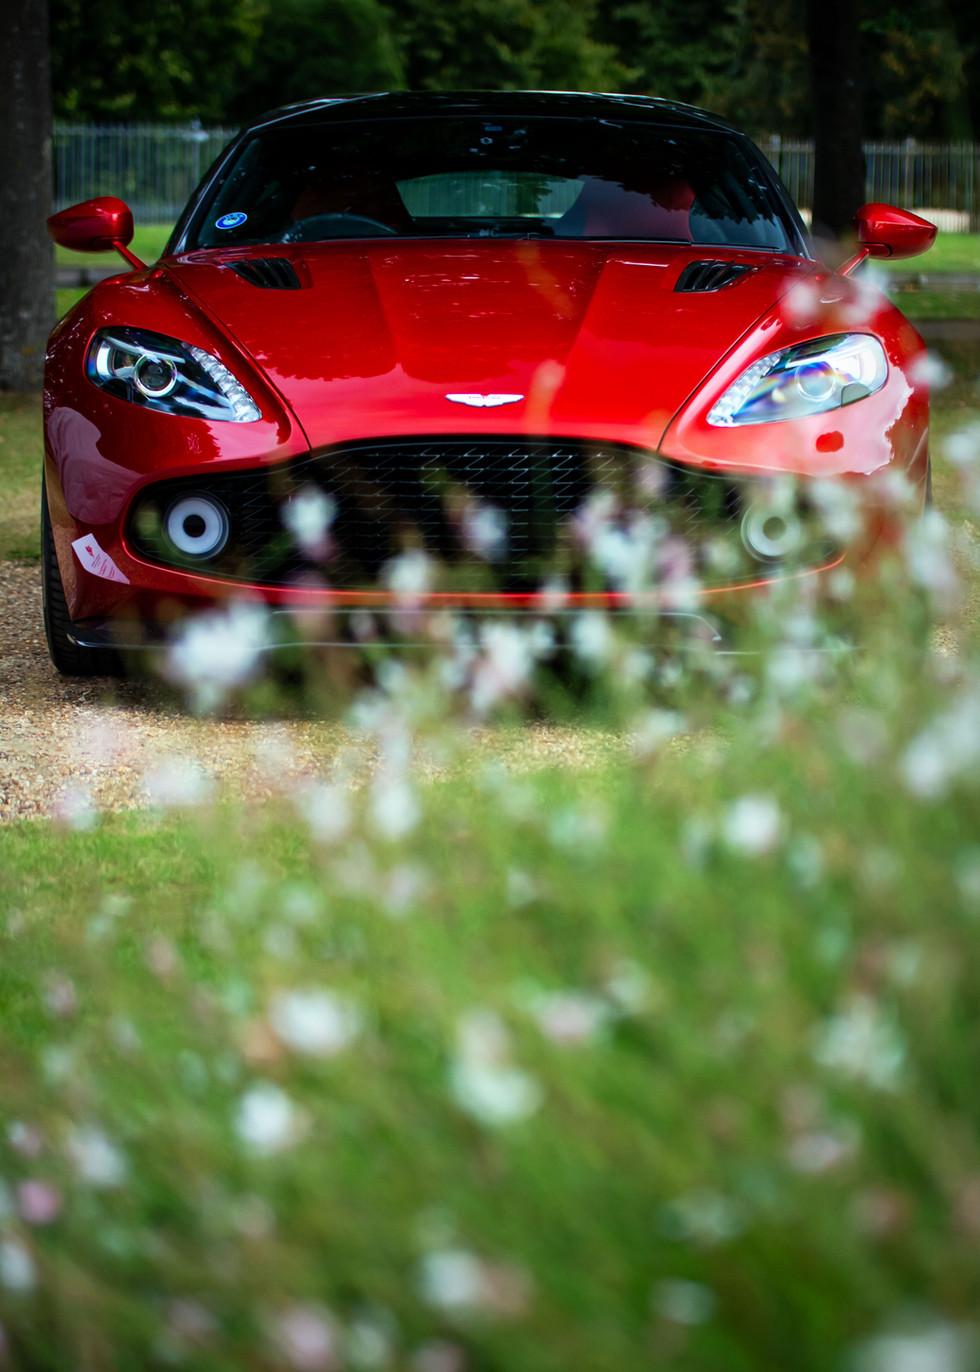 2017 Aston Martin Vanquish Zagato Shooting Brake